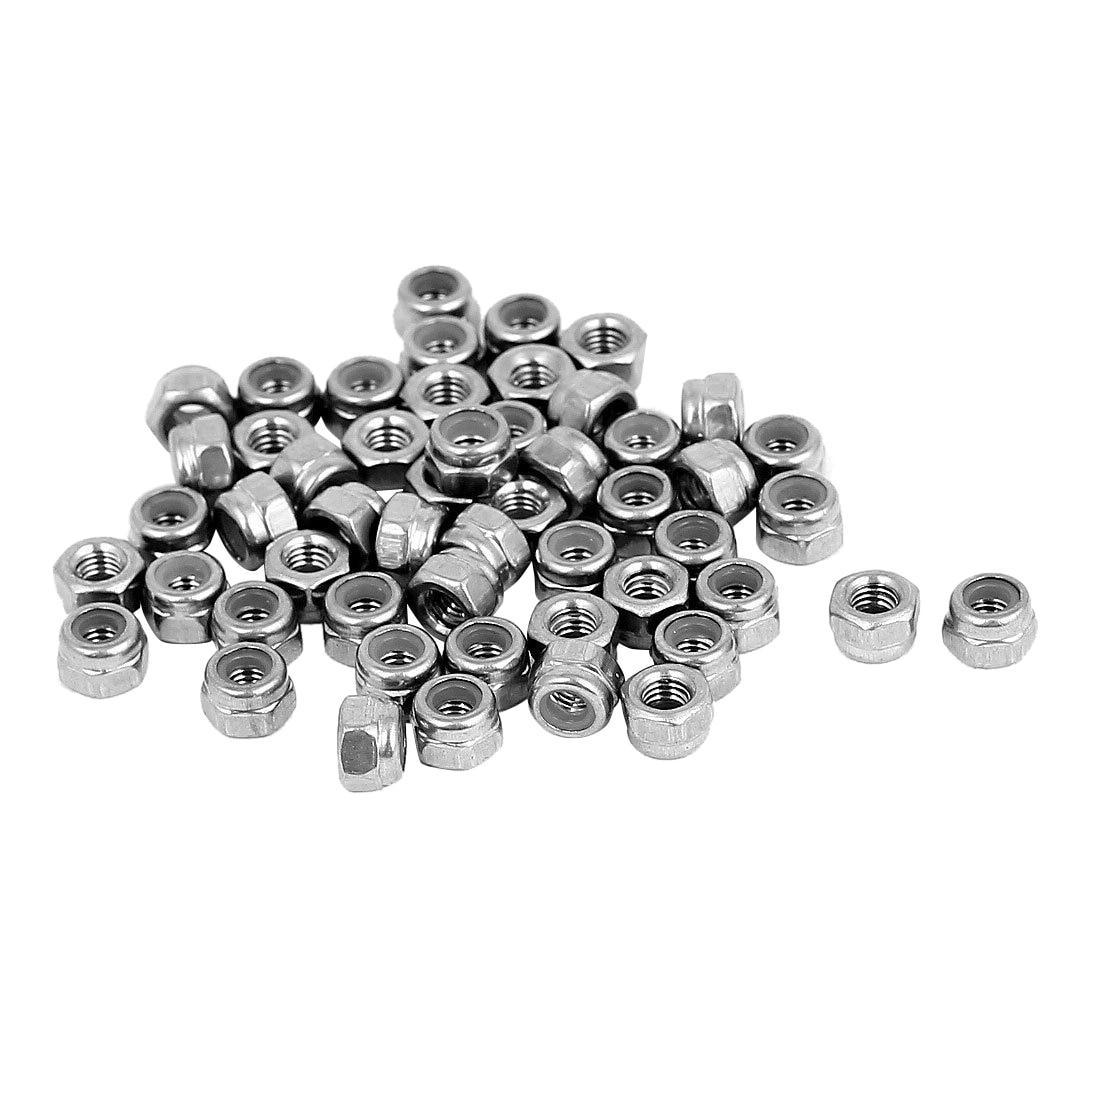 M3 x 0.5mm Stainless Steel Nylock Nylon Insert Hex Lock Nuts 50pcs